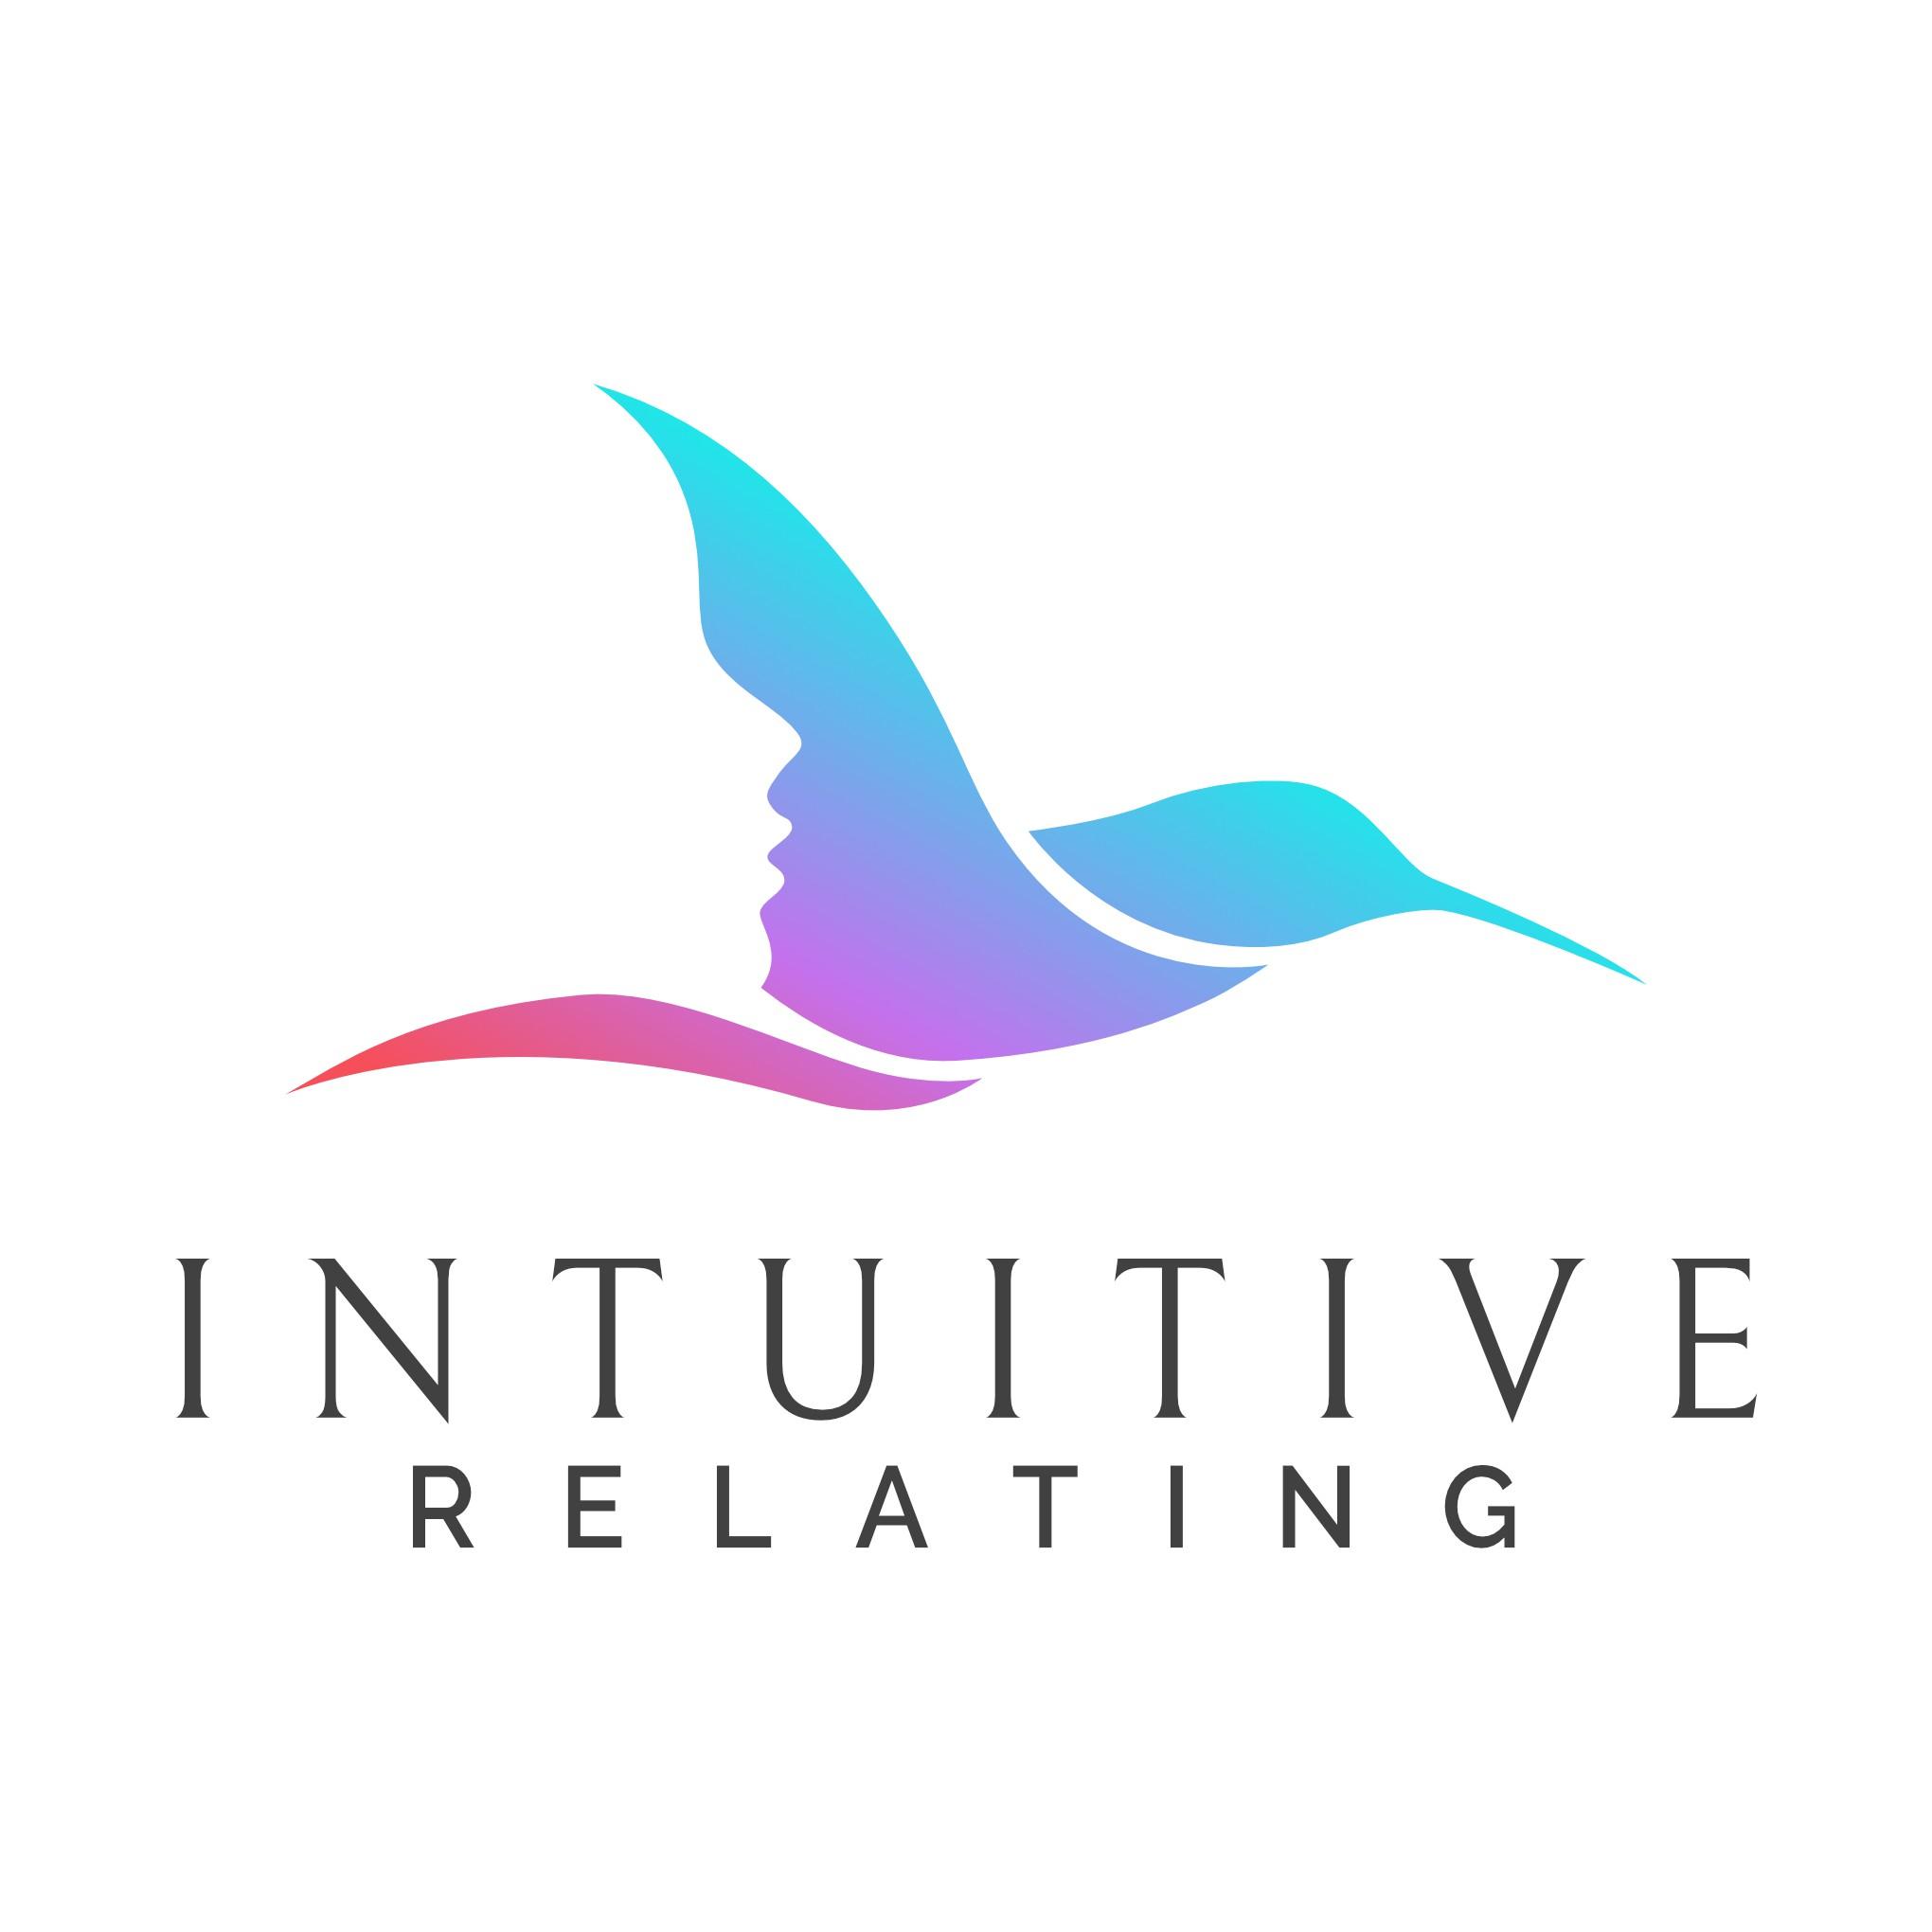 Intuitive Relating Spiritual Coaching Business Logo